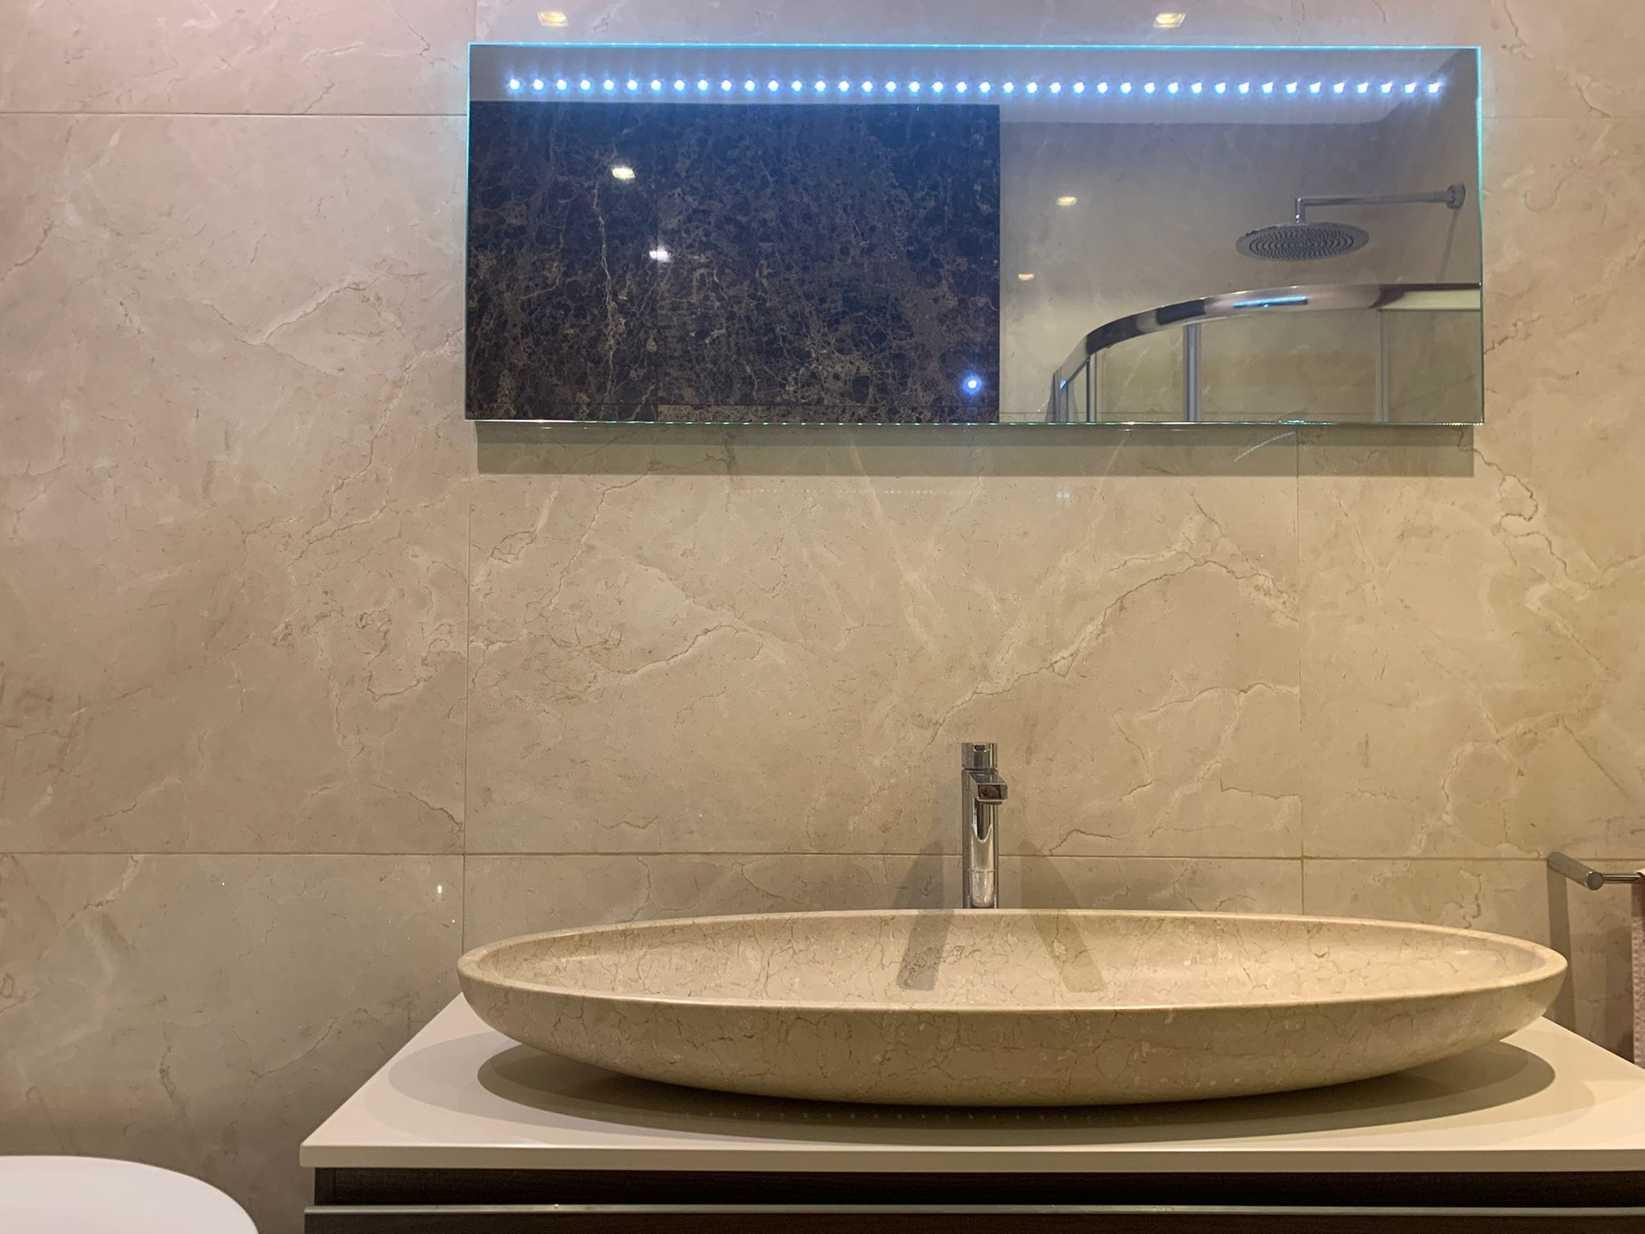 4 bed Villa For Rent in Ibragg, Ibragg - thumb 11